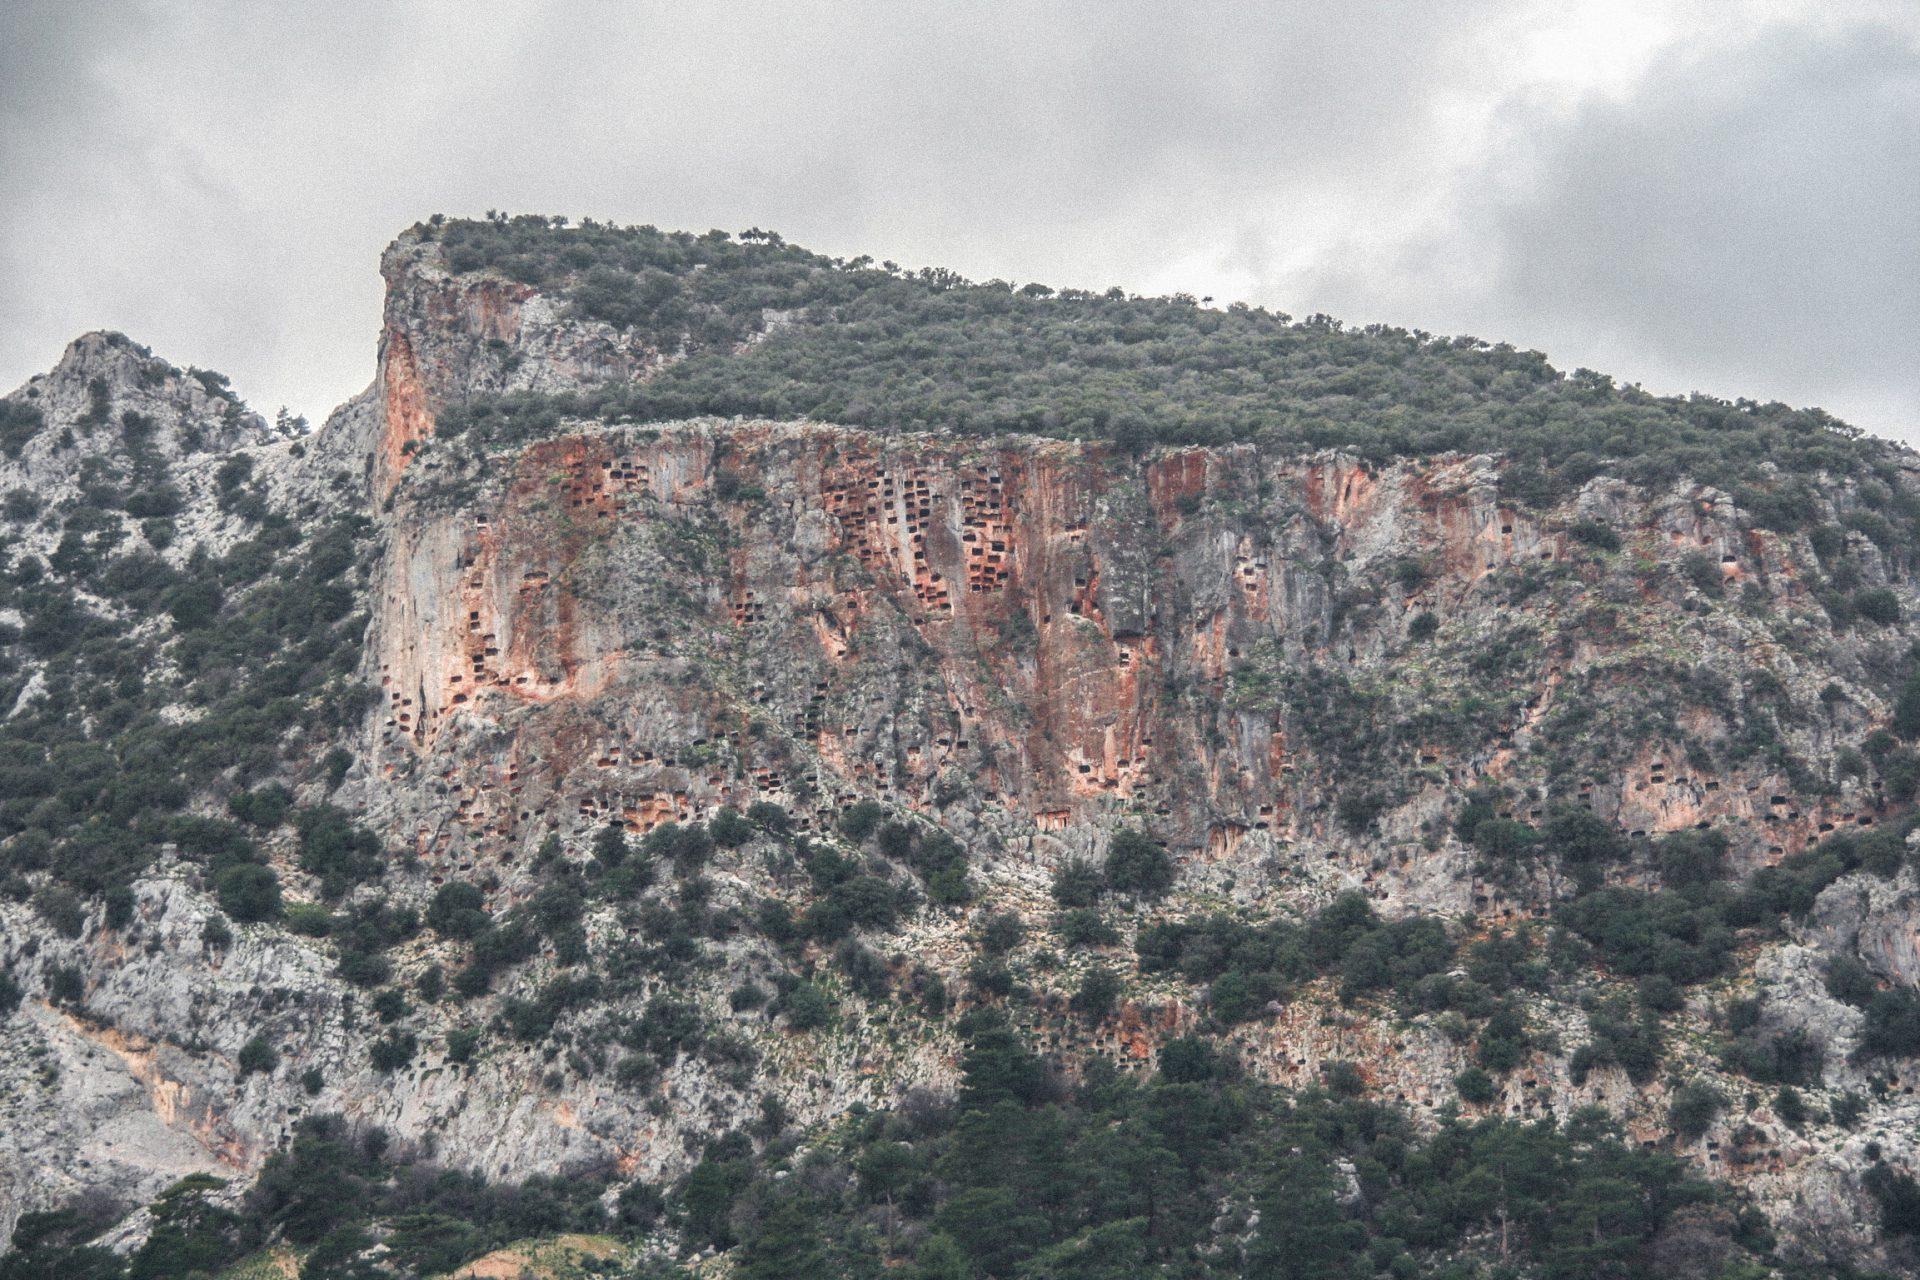 Felsengräber von Pinara, Türkei